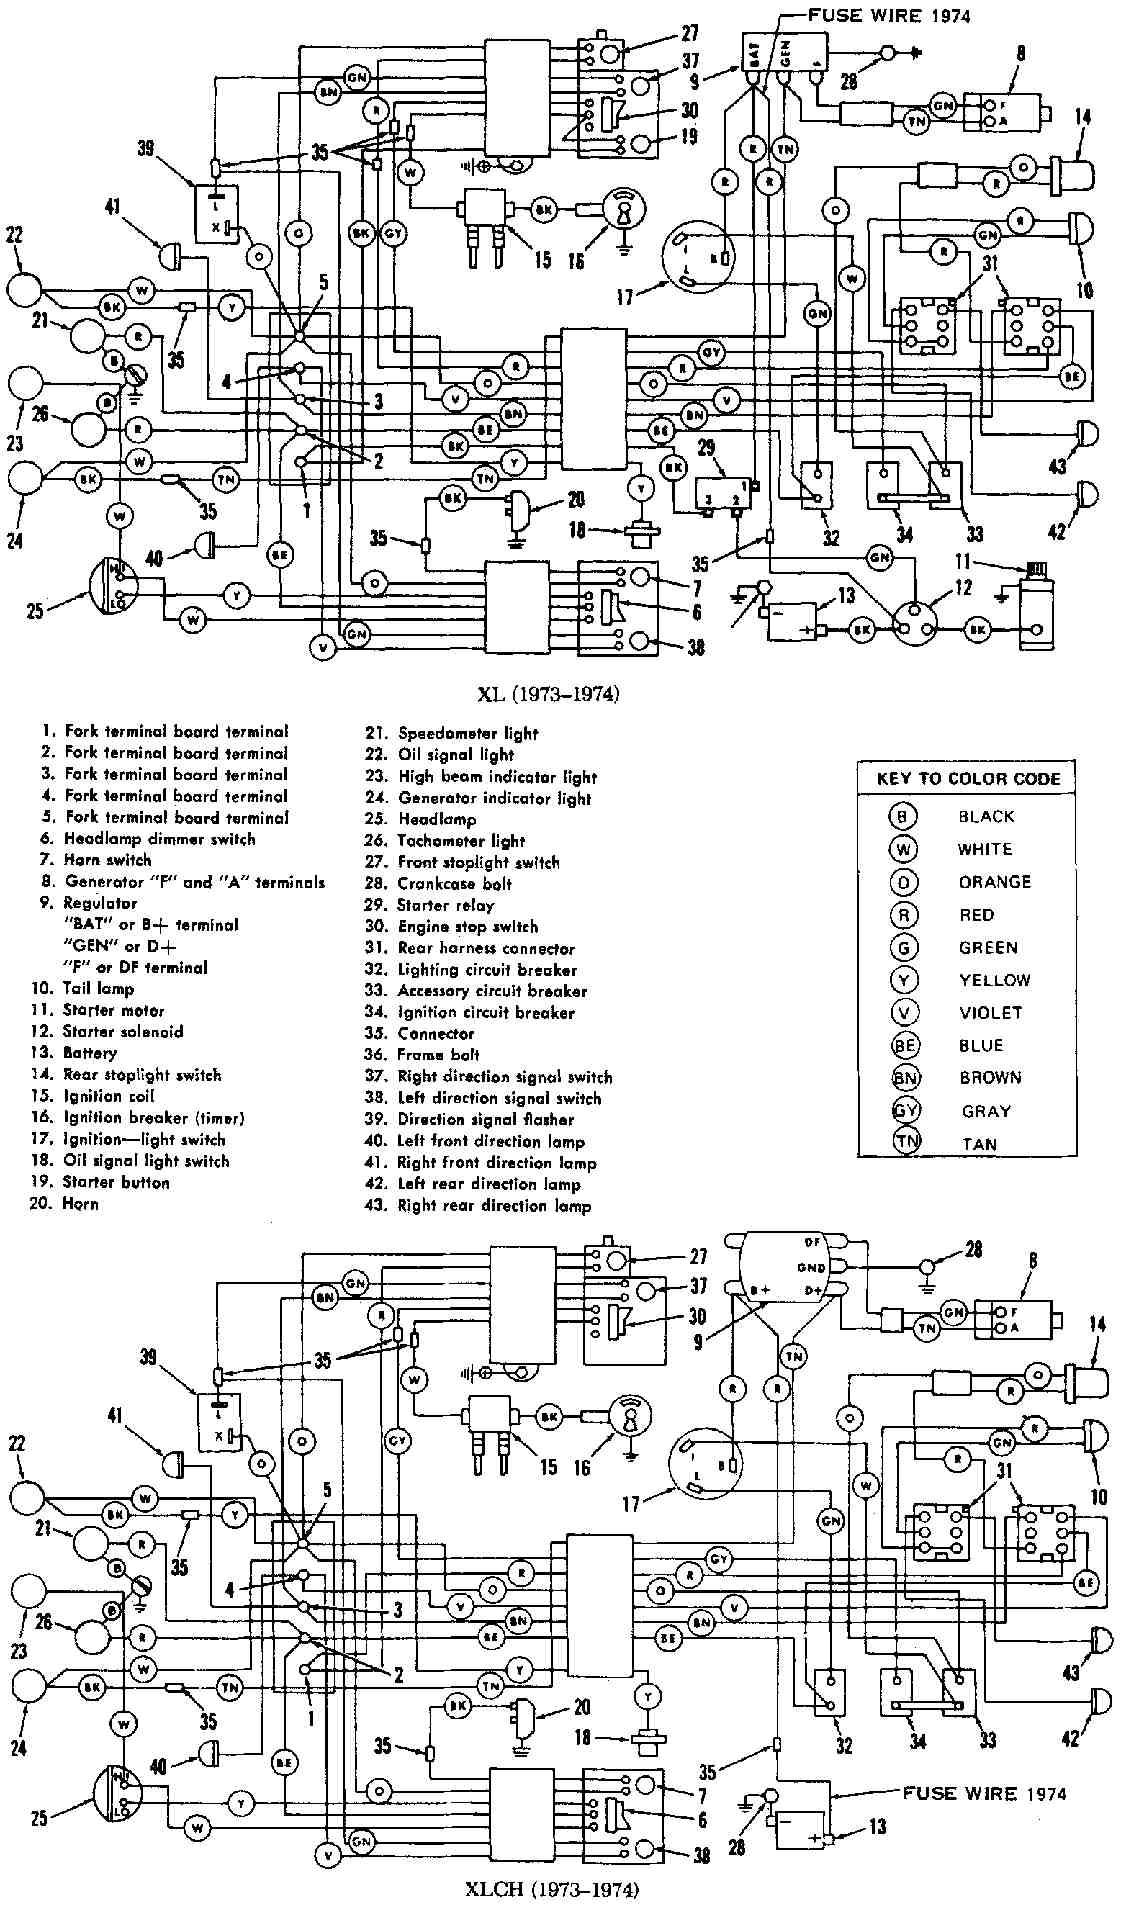 Flhr Wiring Diagram Online Schematics 2011 Victory Vision Harle Davidson Engine Diagrams Trusted Electric Motor 1973 Shovelhead